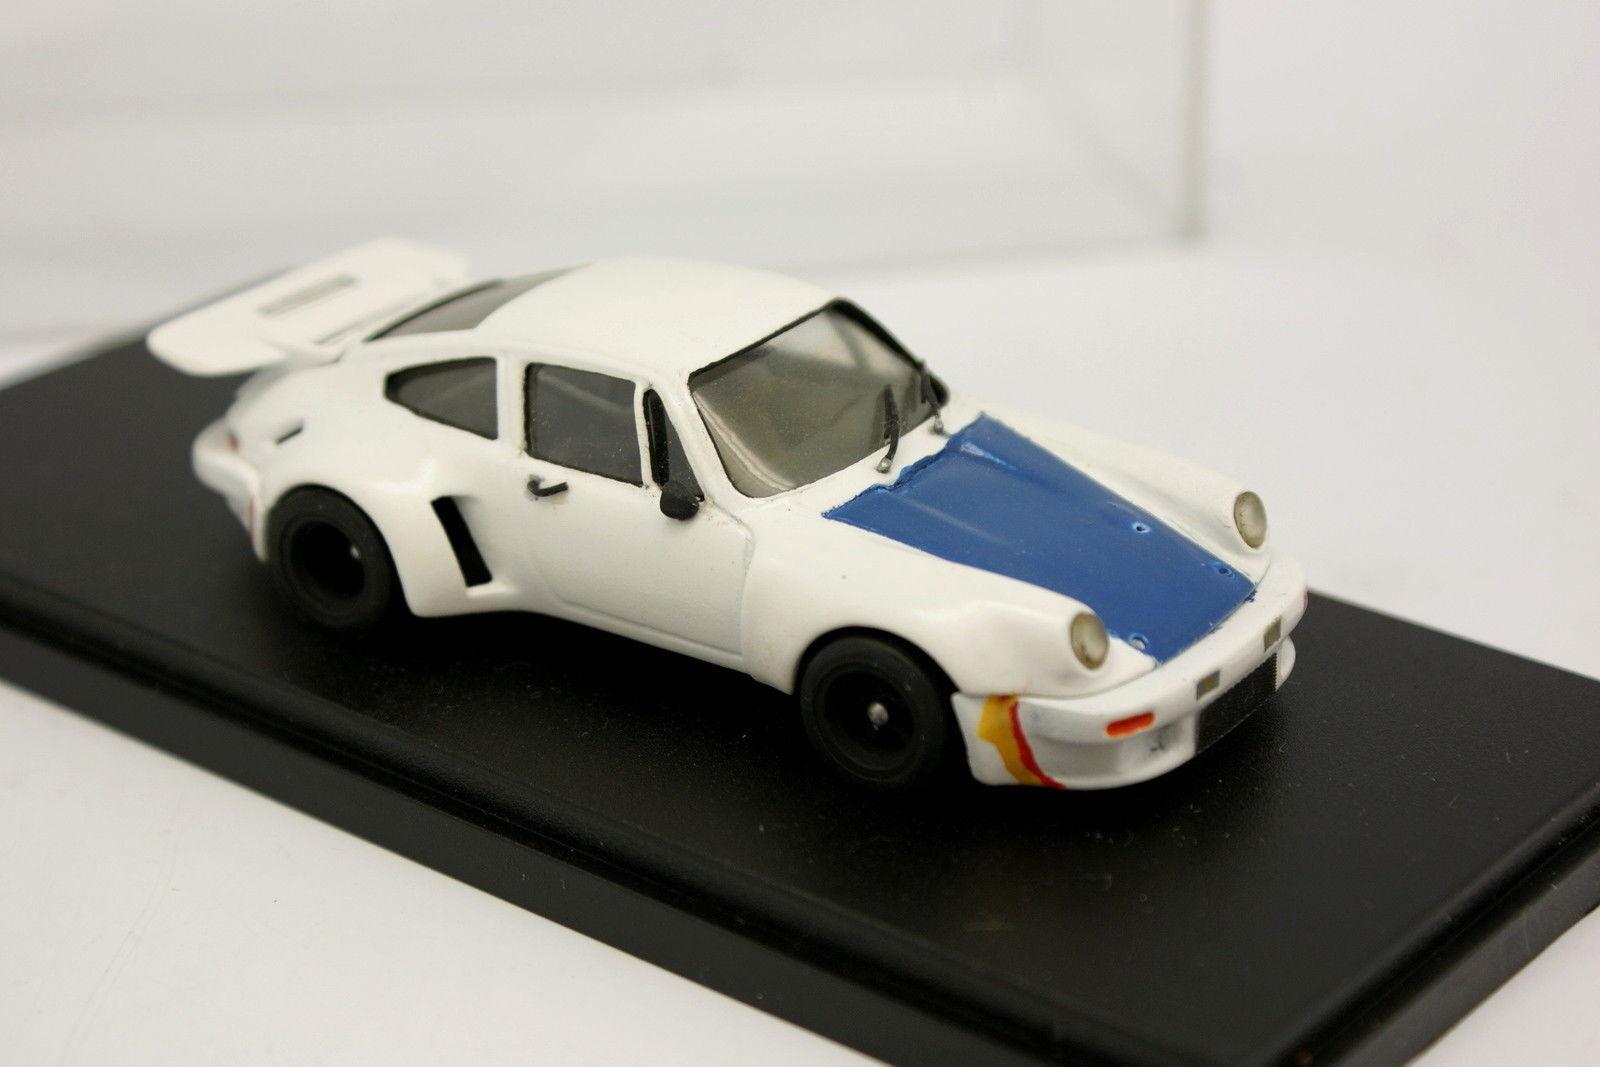 AMR 1 43 - Porsche 911 911 911 Carrera Buchet white blue cd1540